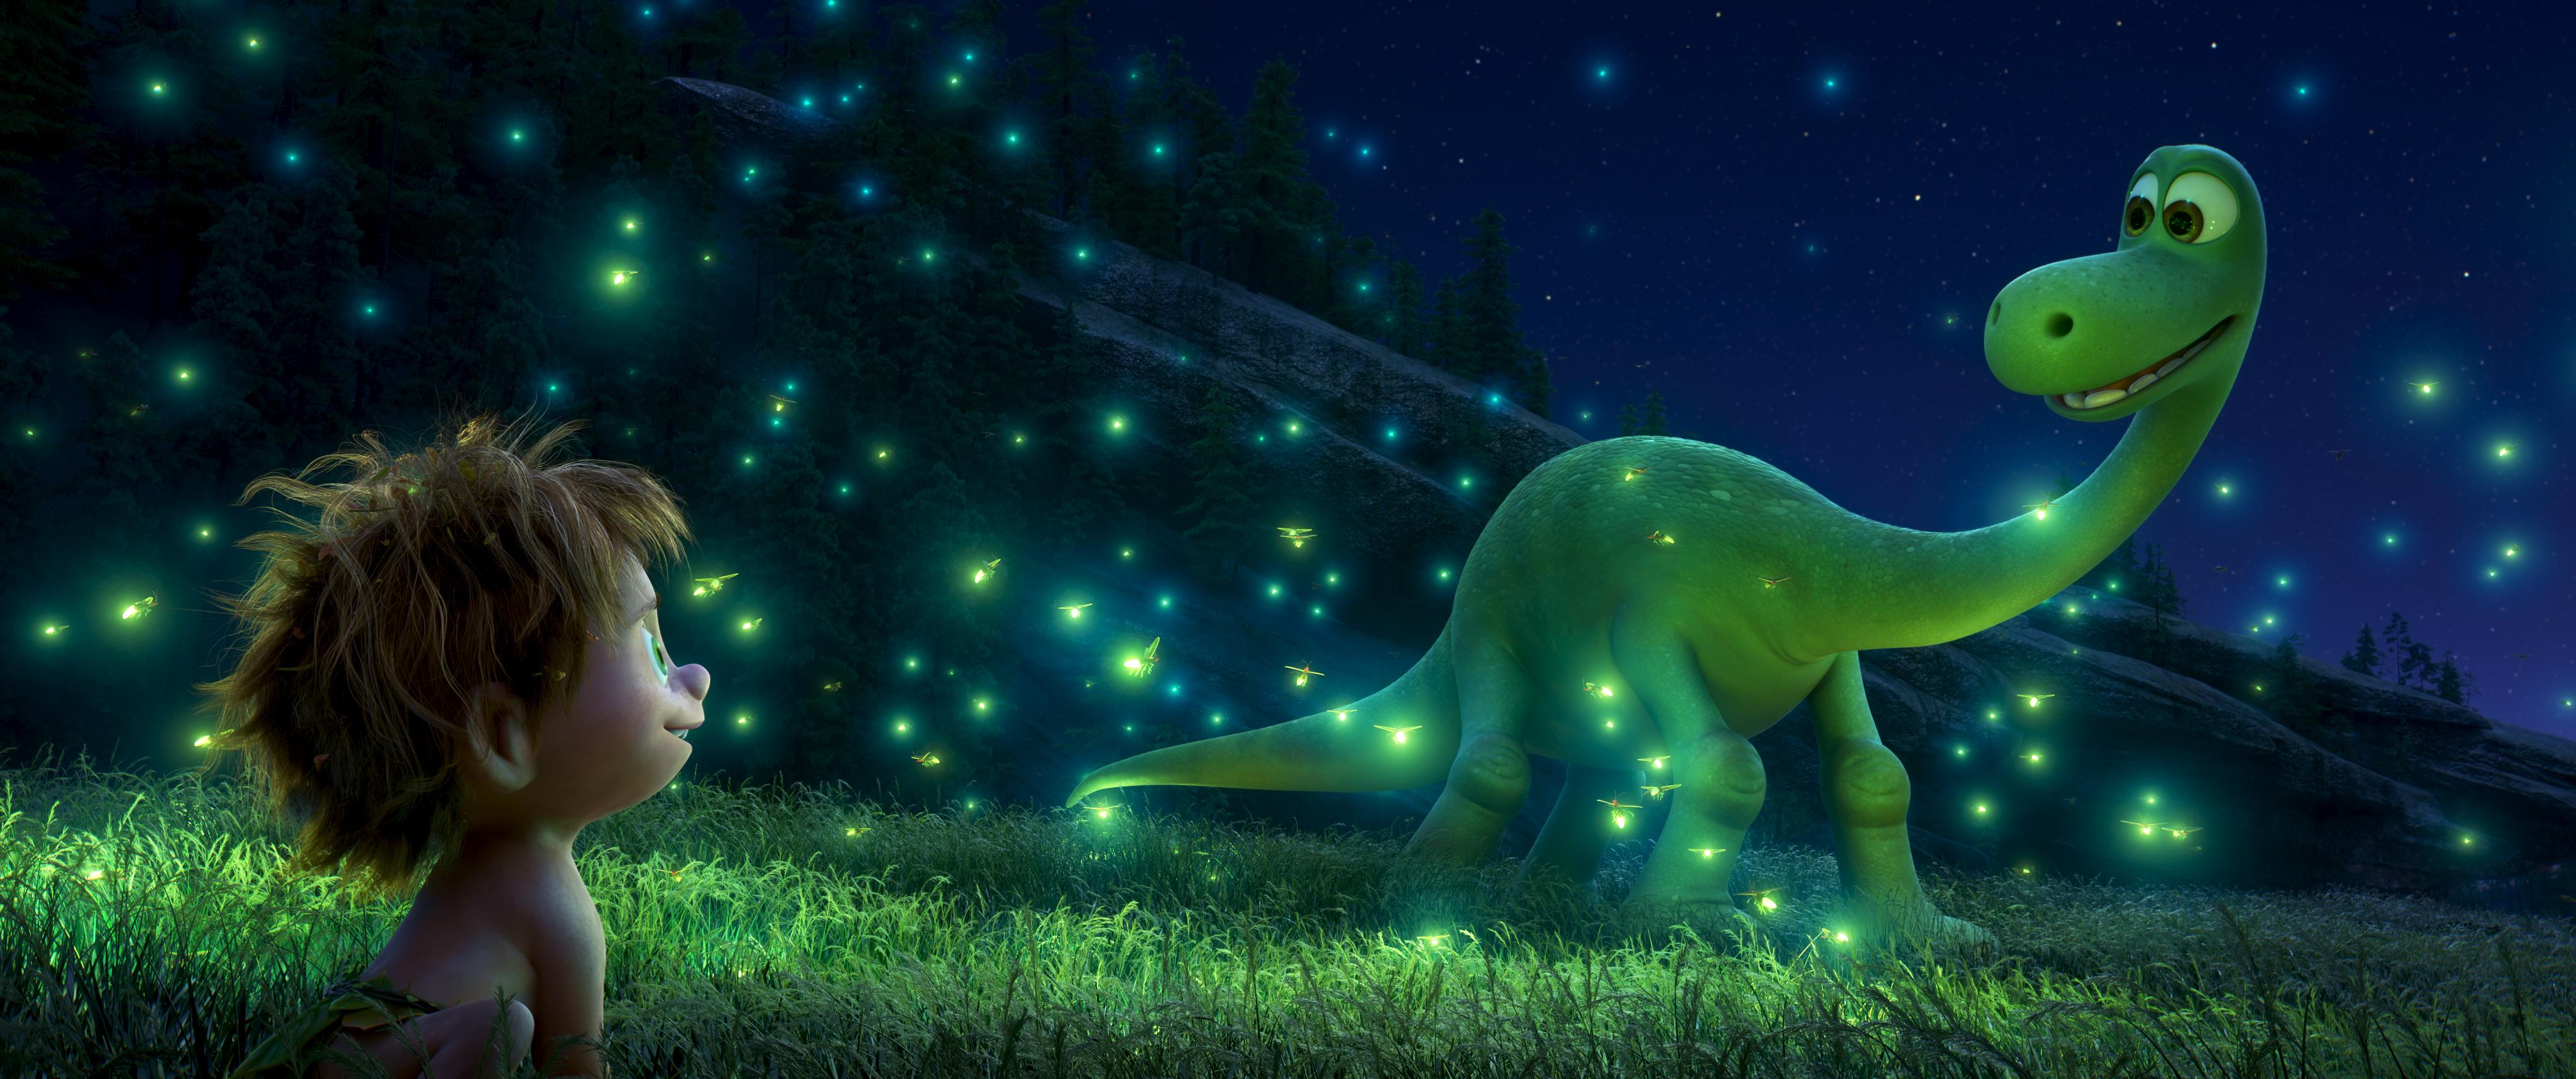 Disney Pixar The Good Dinosaur Printable Activity Sheets